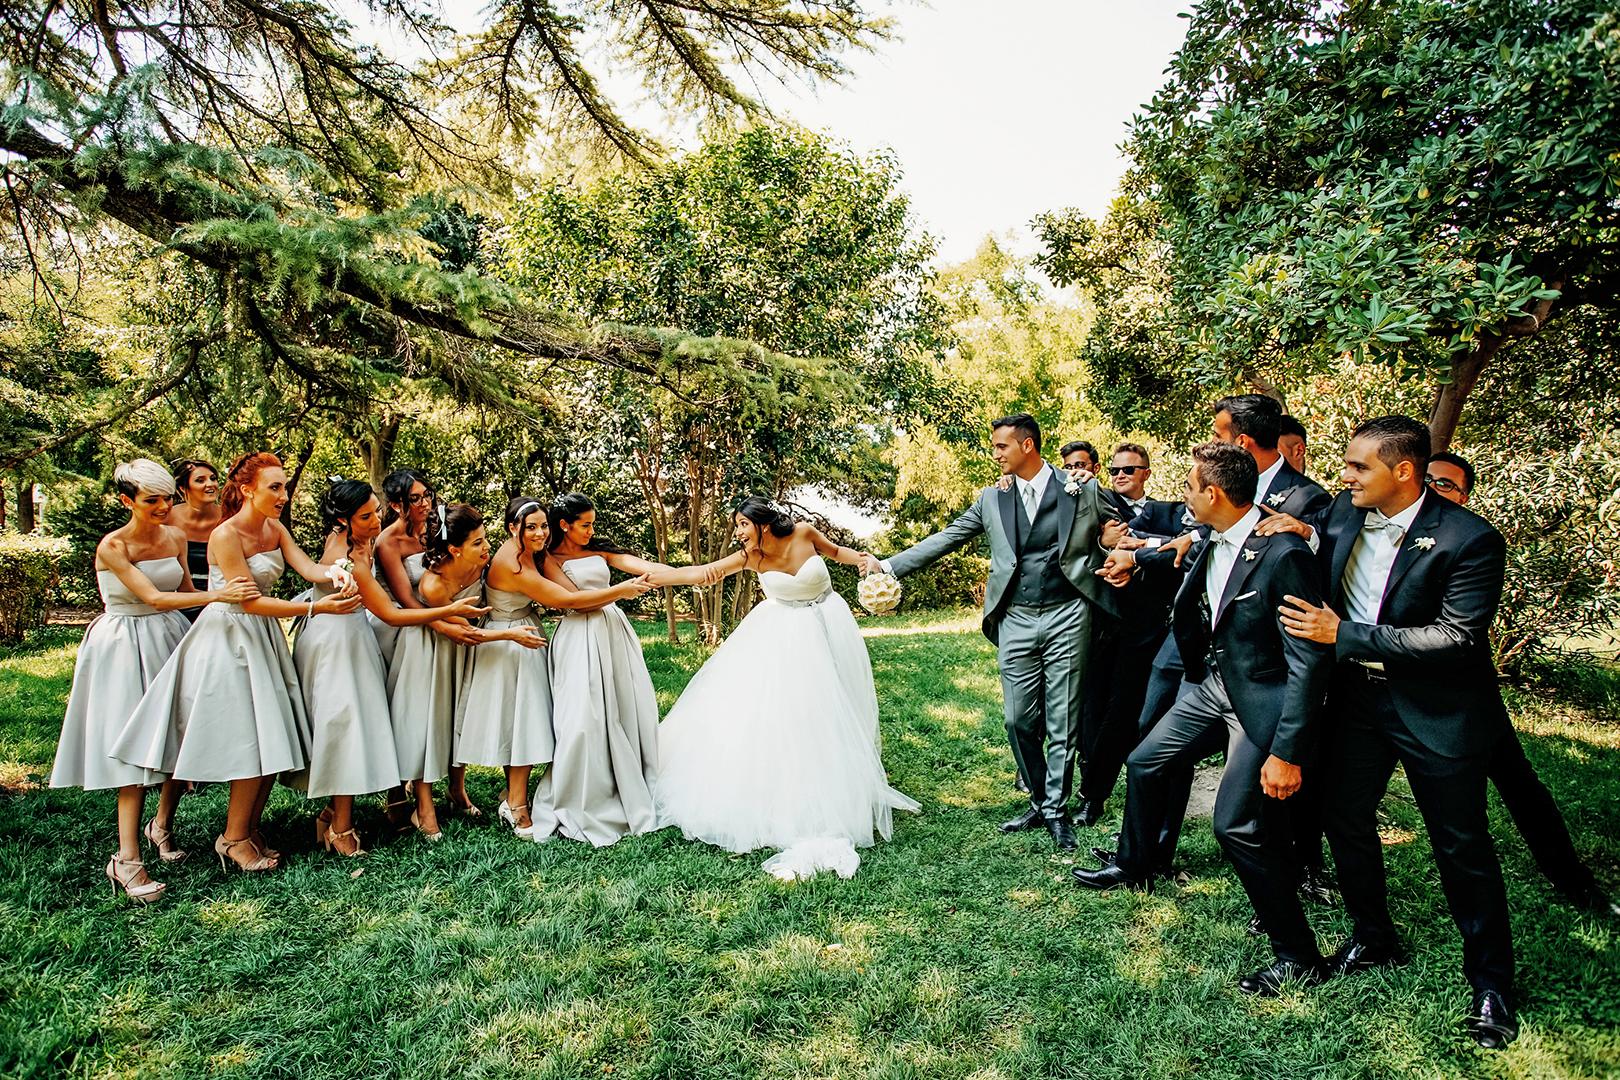 40 gianni-lepore-damigelle-amici-sposi